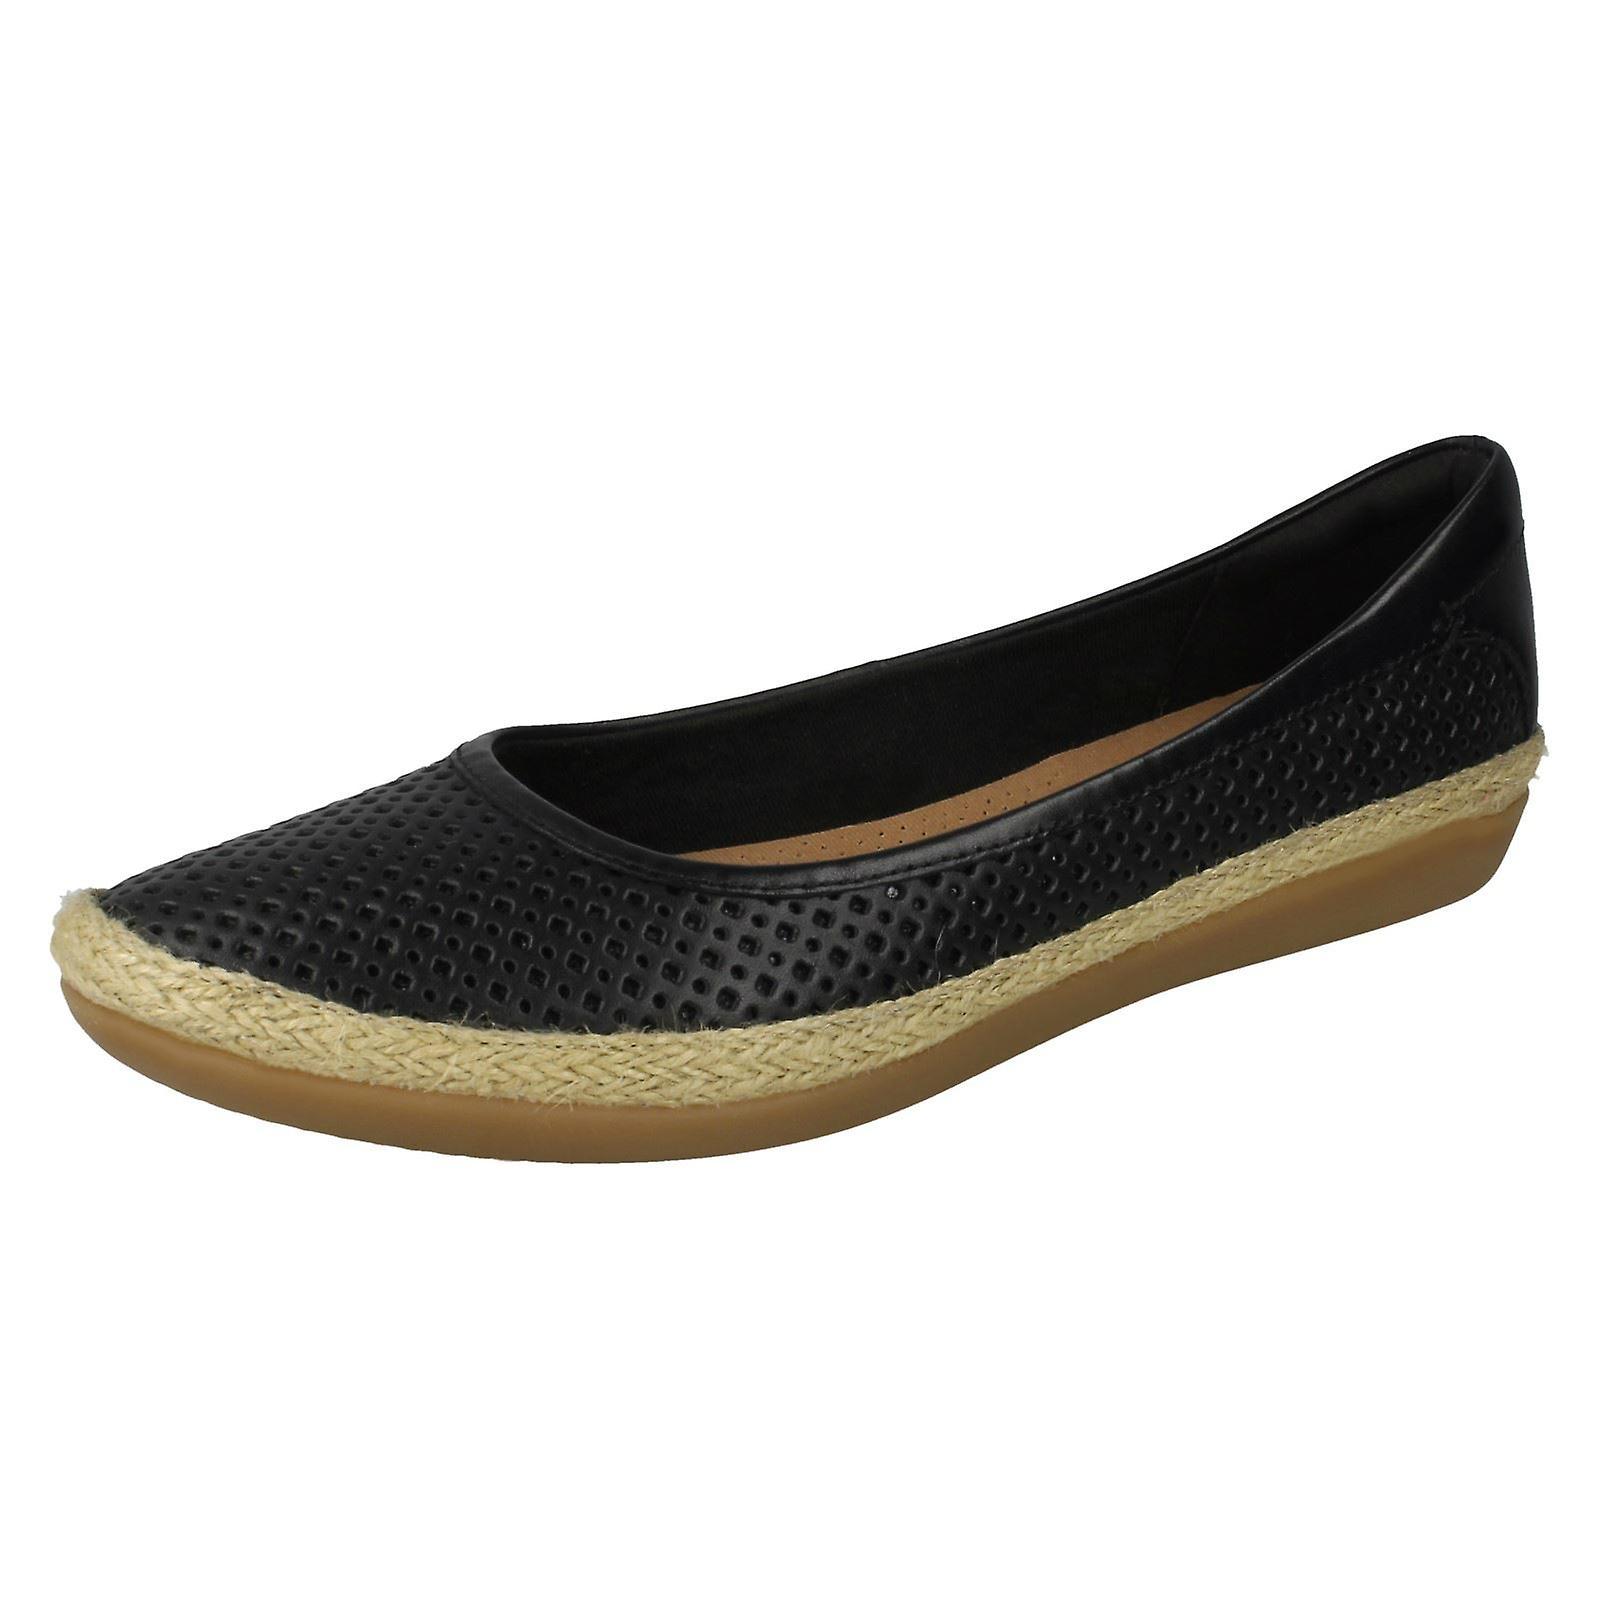 Damen Clarks Sommer Ballerina flache Schuhe